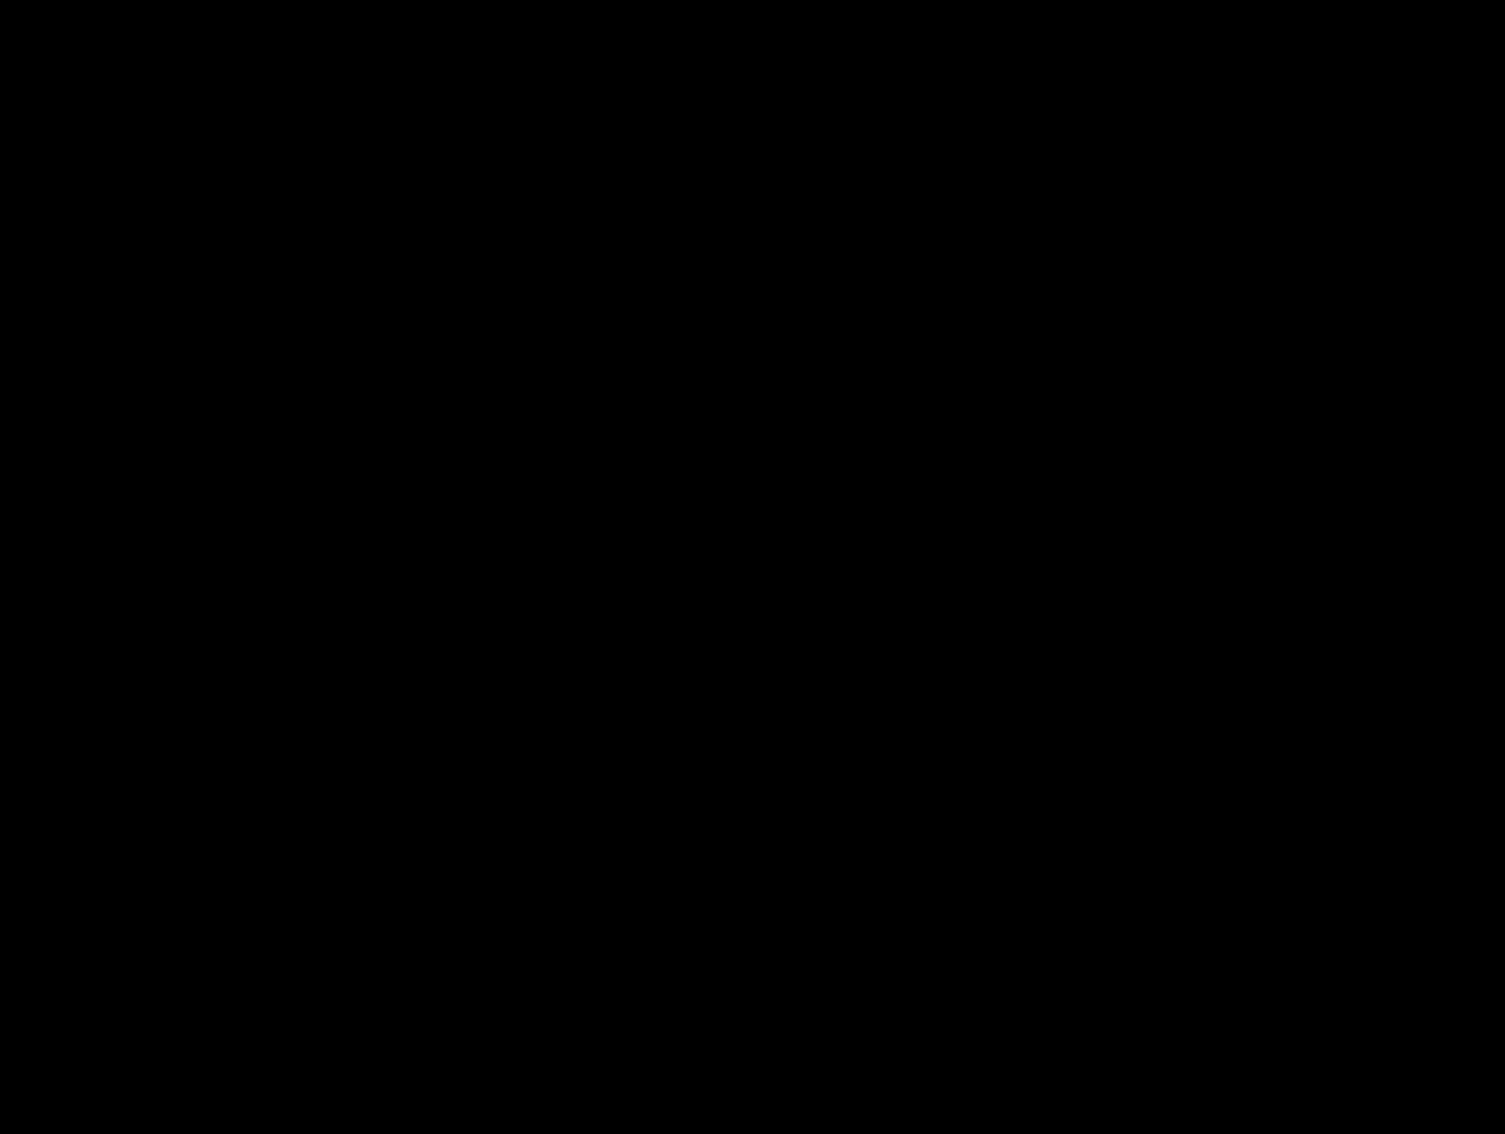 Blaues Helmkraut